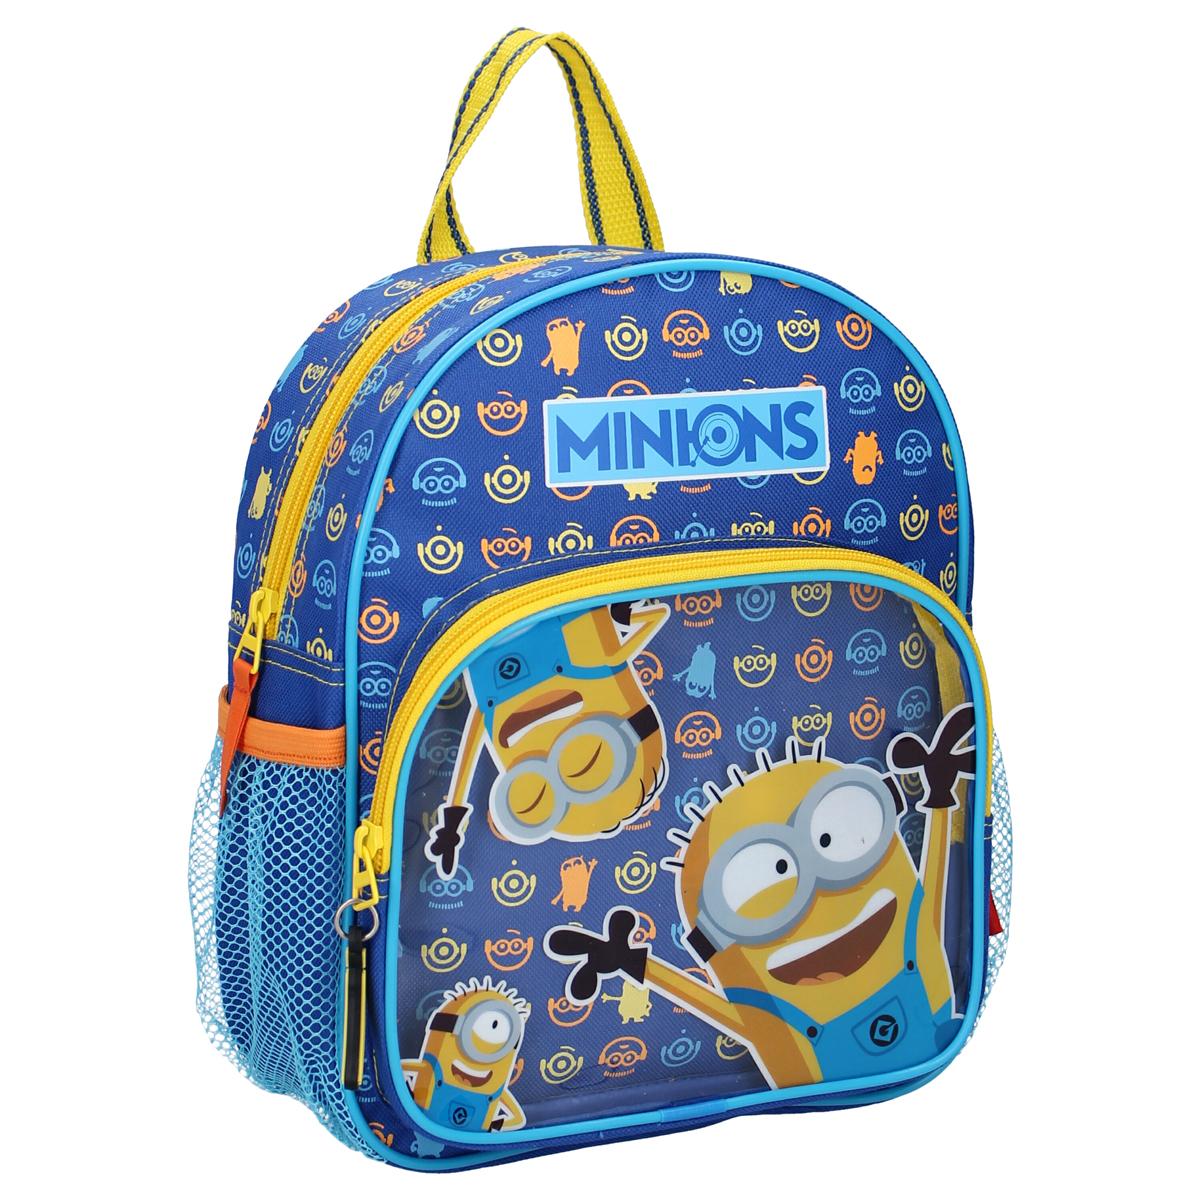 Sac à Dos \'Minions\' bleu  jaune - 28x22x9 cm - [A0597]